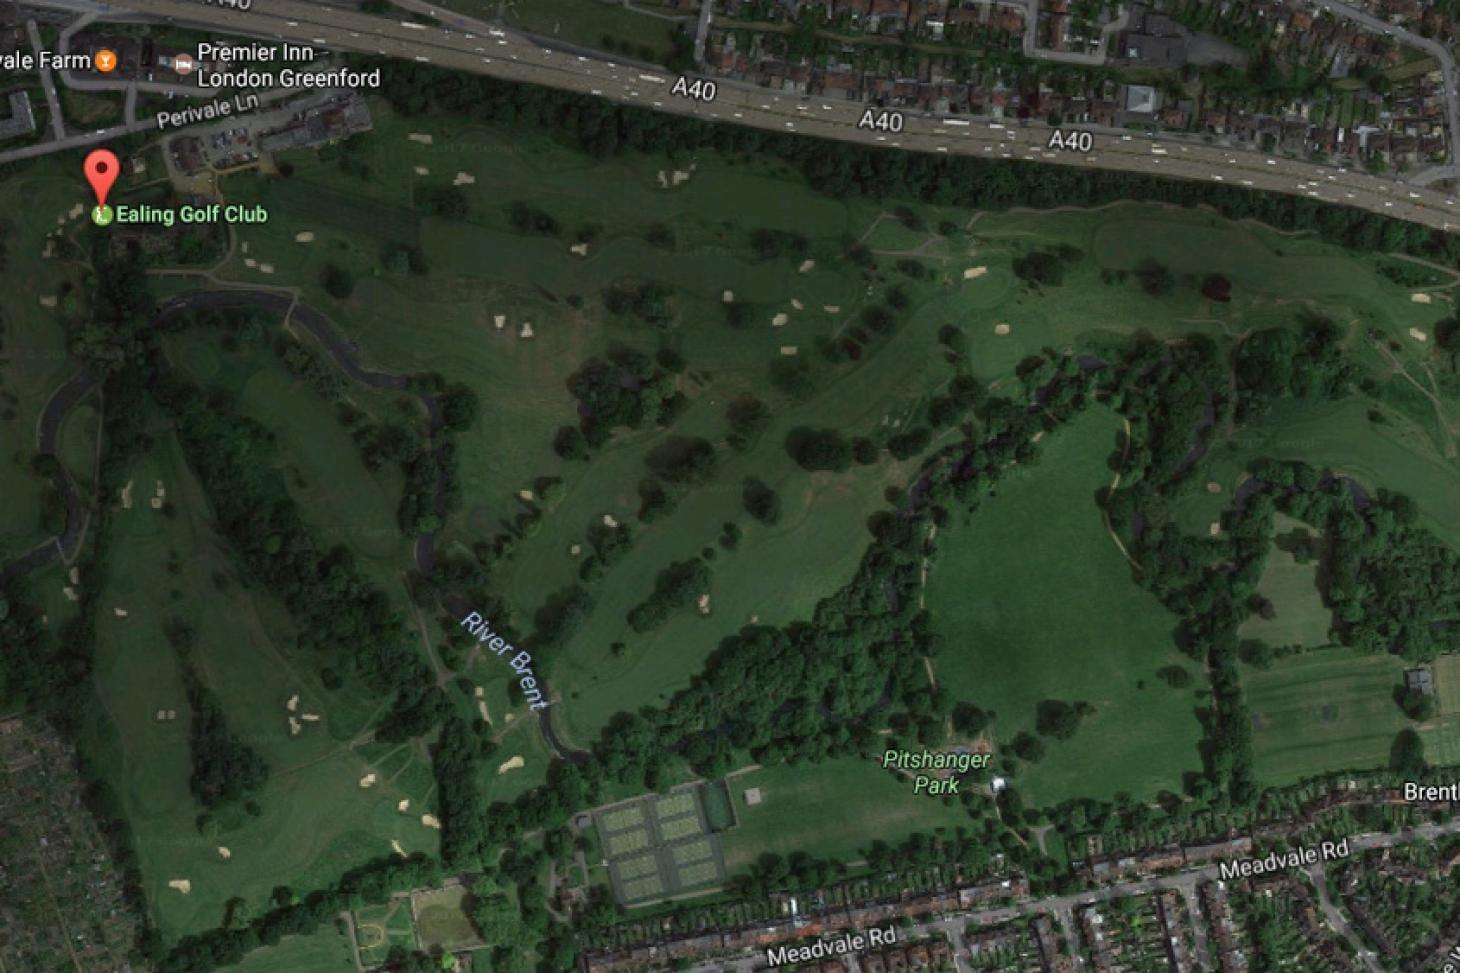 Ealing Golf Course 18 hole golf course